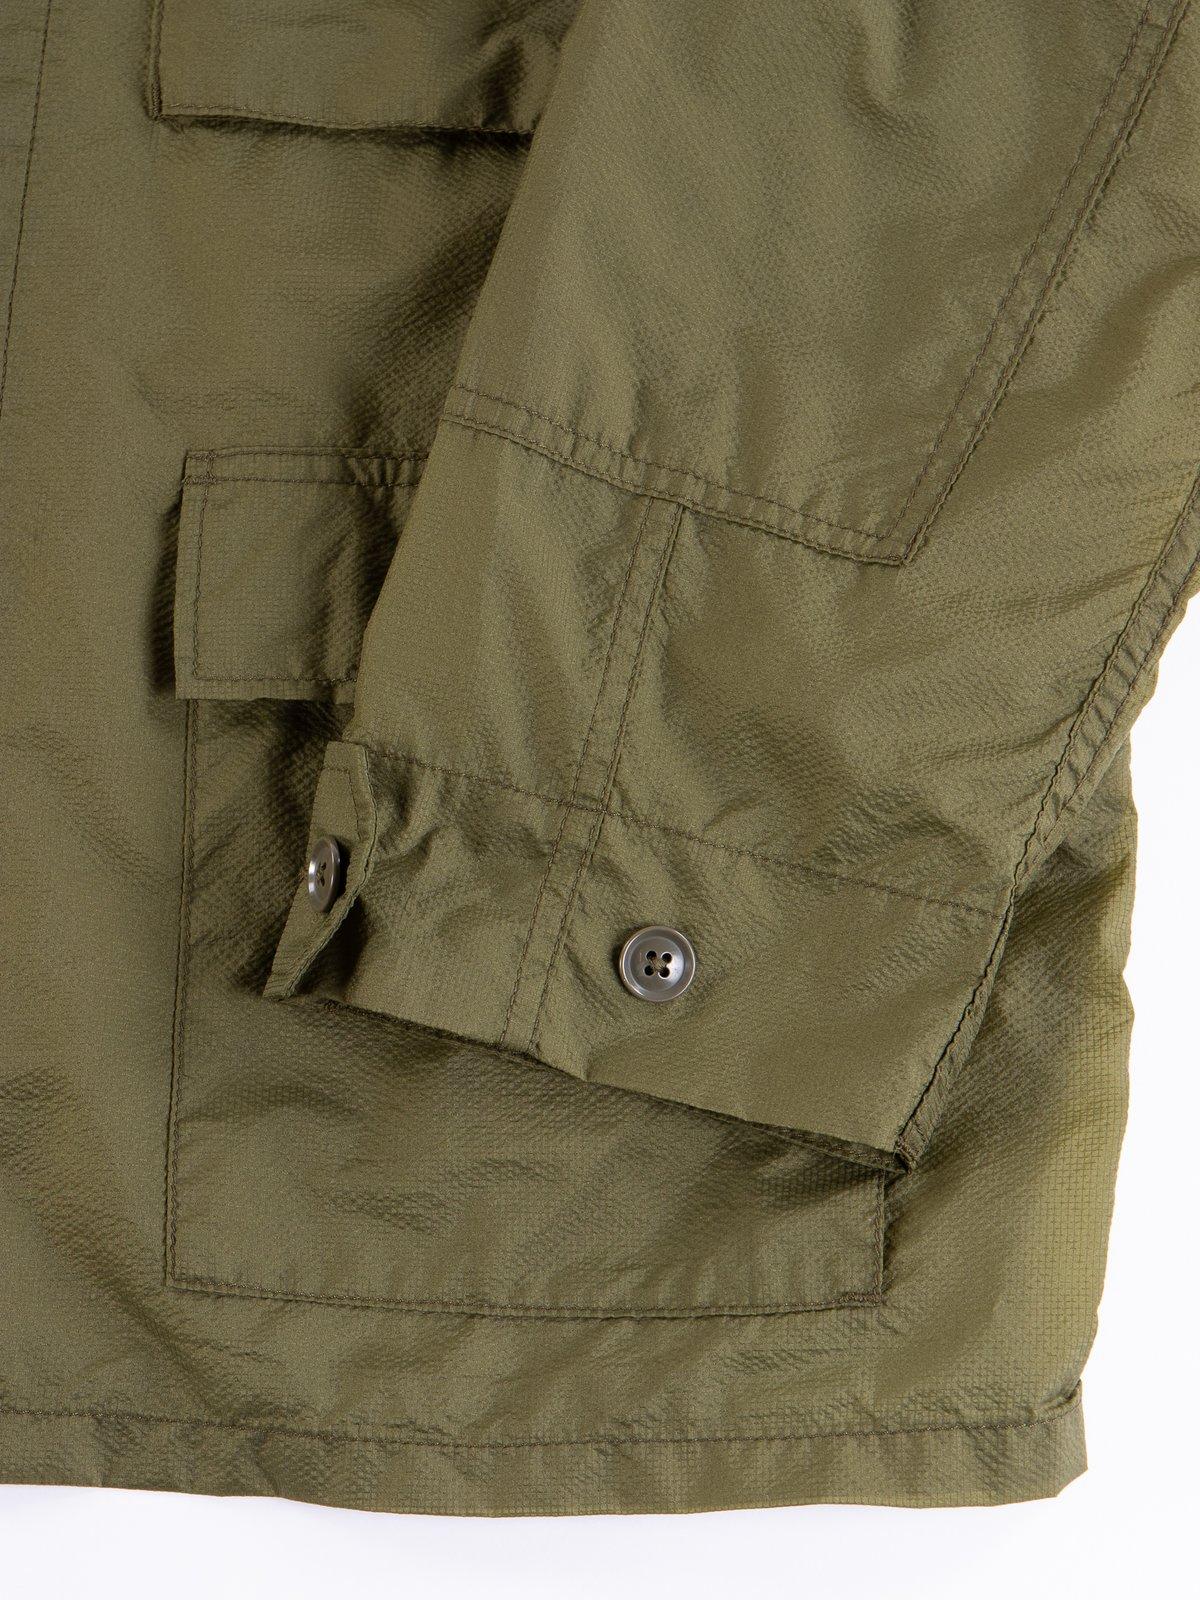 Olive Nylon Micro Ripstop BDU Jacket - Image 4